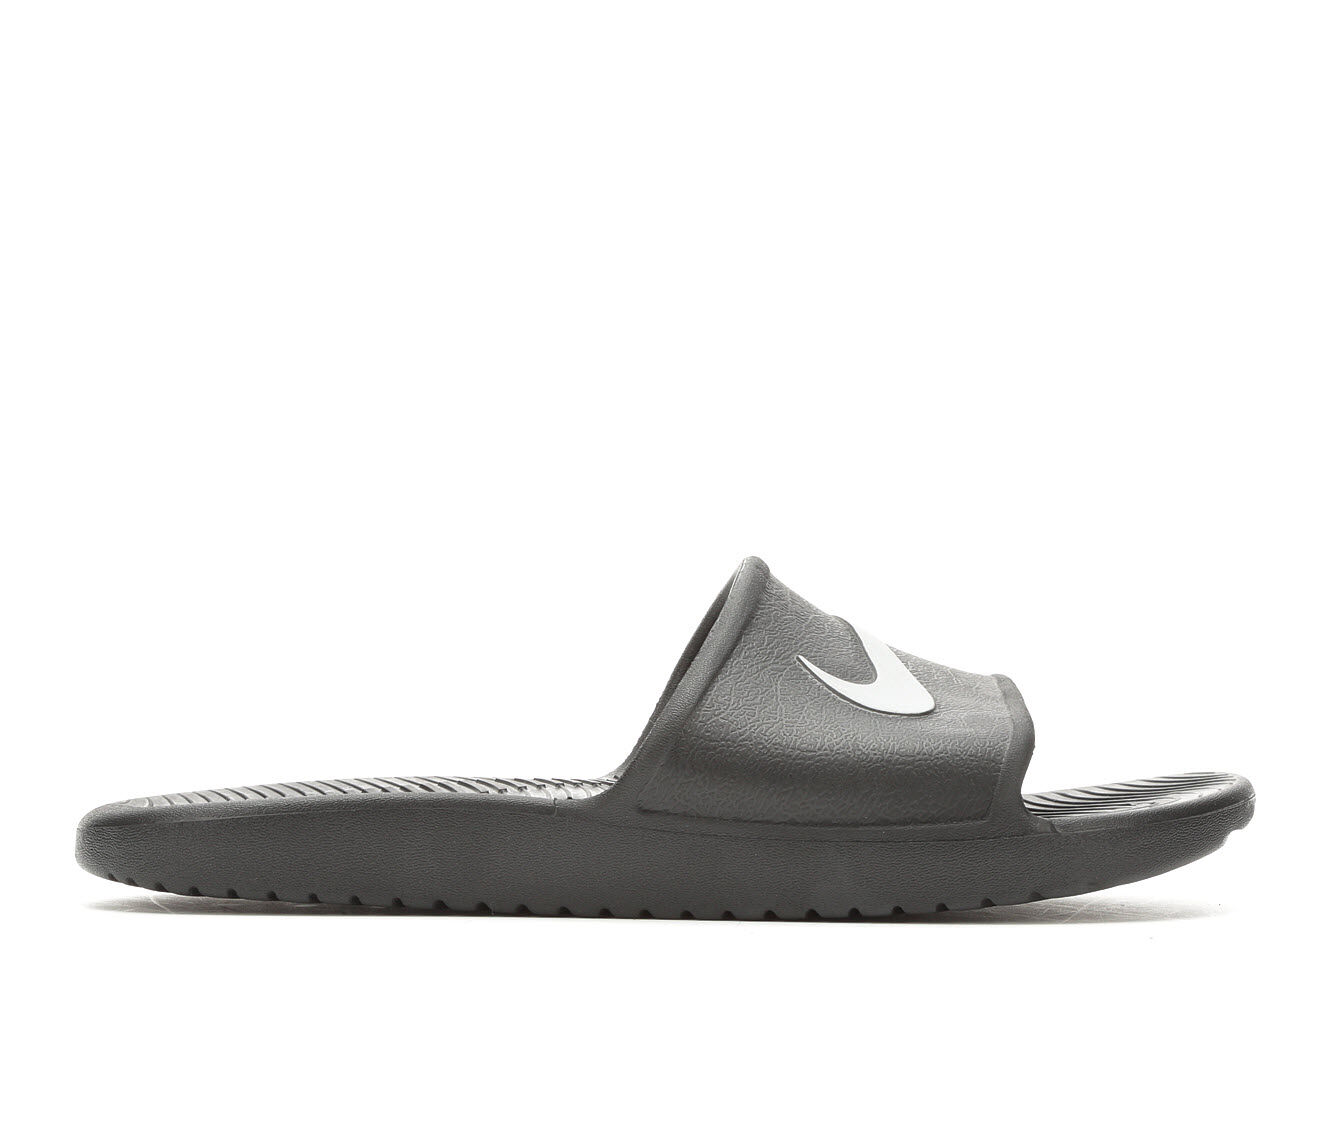 uk shoes_kd2570